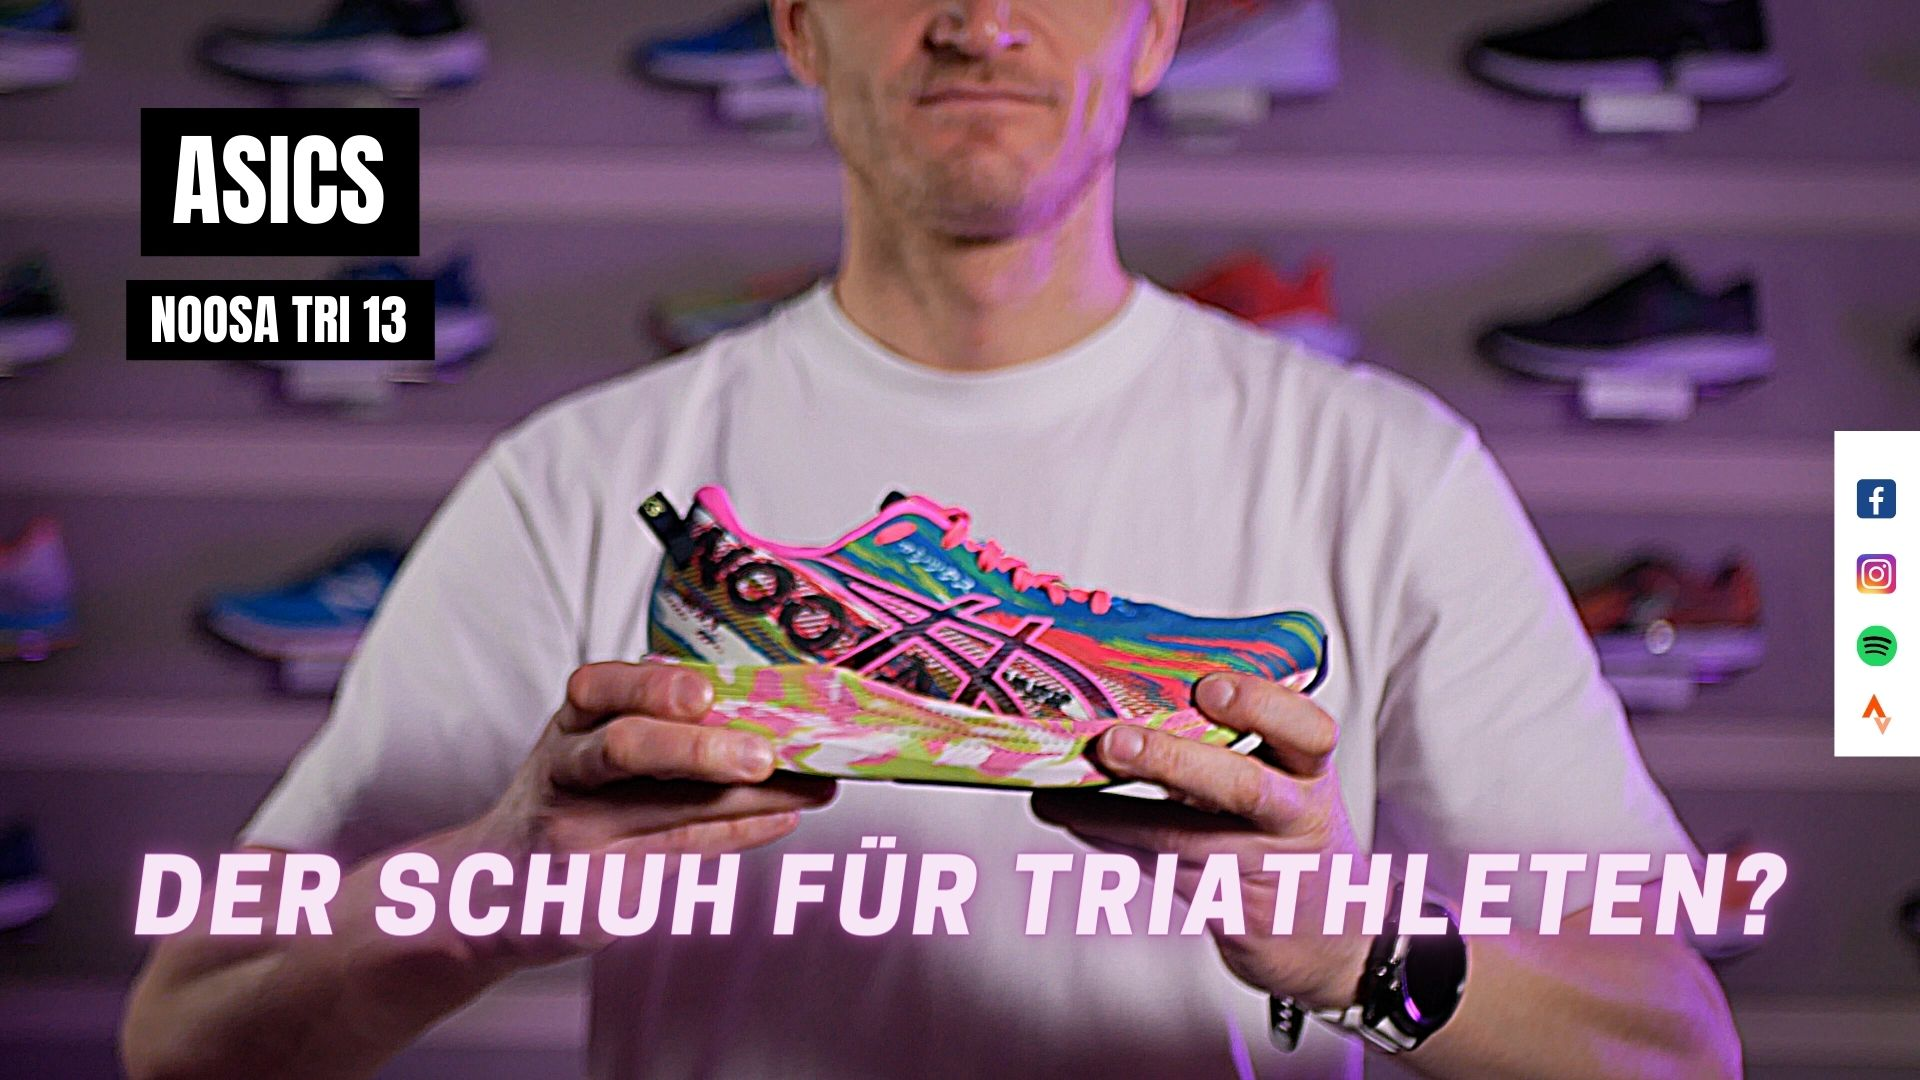 Laufschuh Test: Asics Noosa 13 (German | Deutsch)